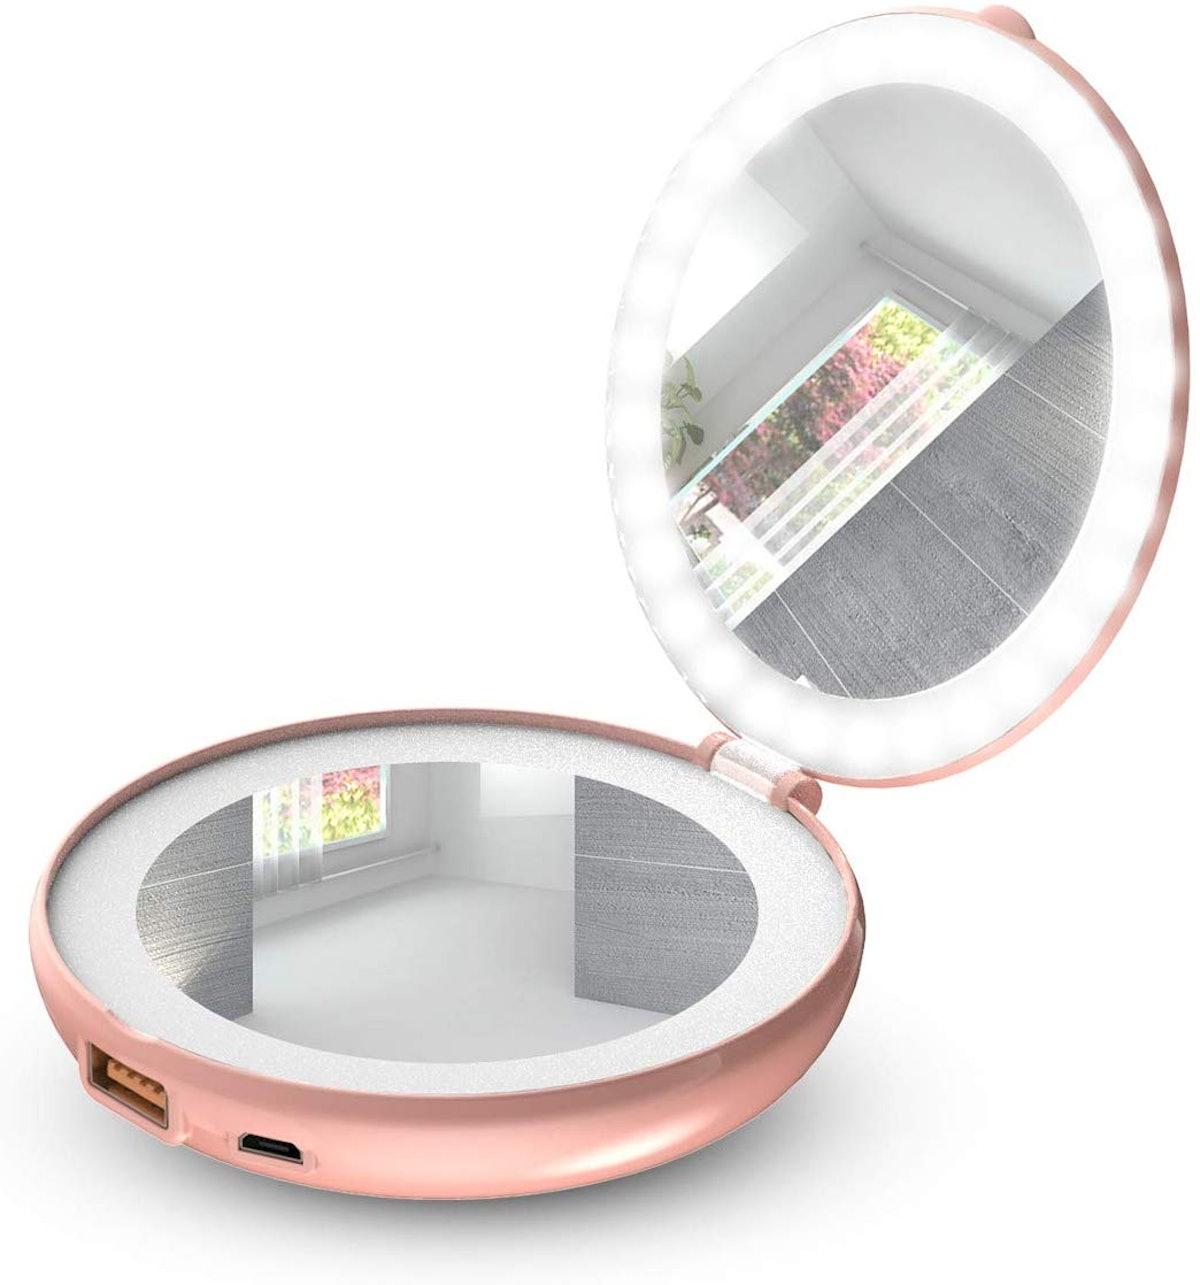 VinSa LED Mirror